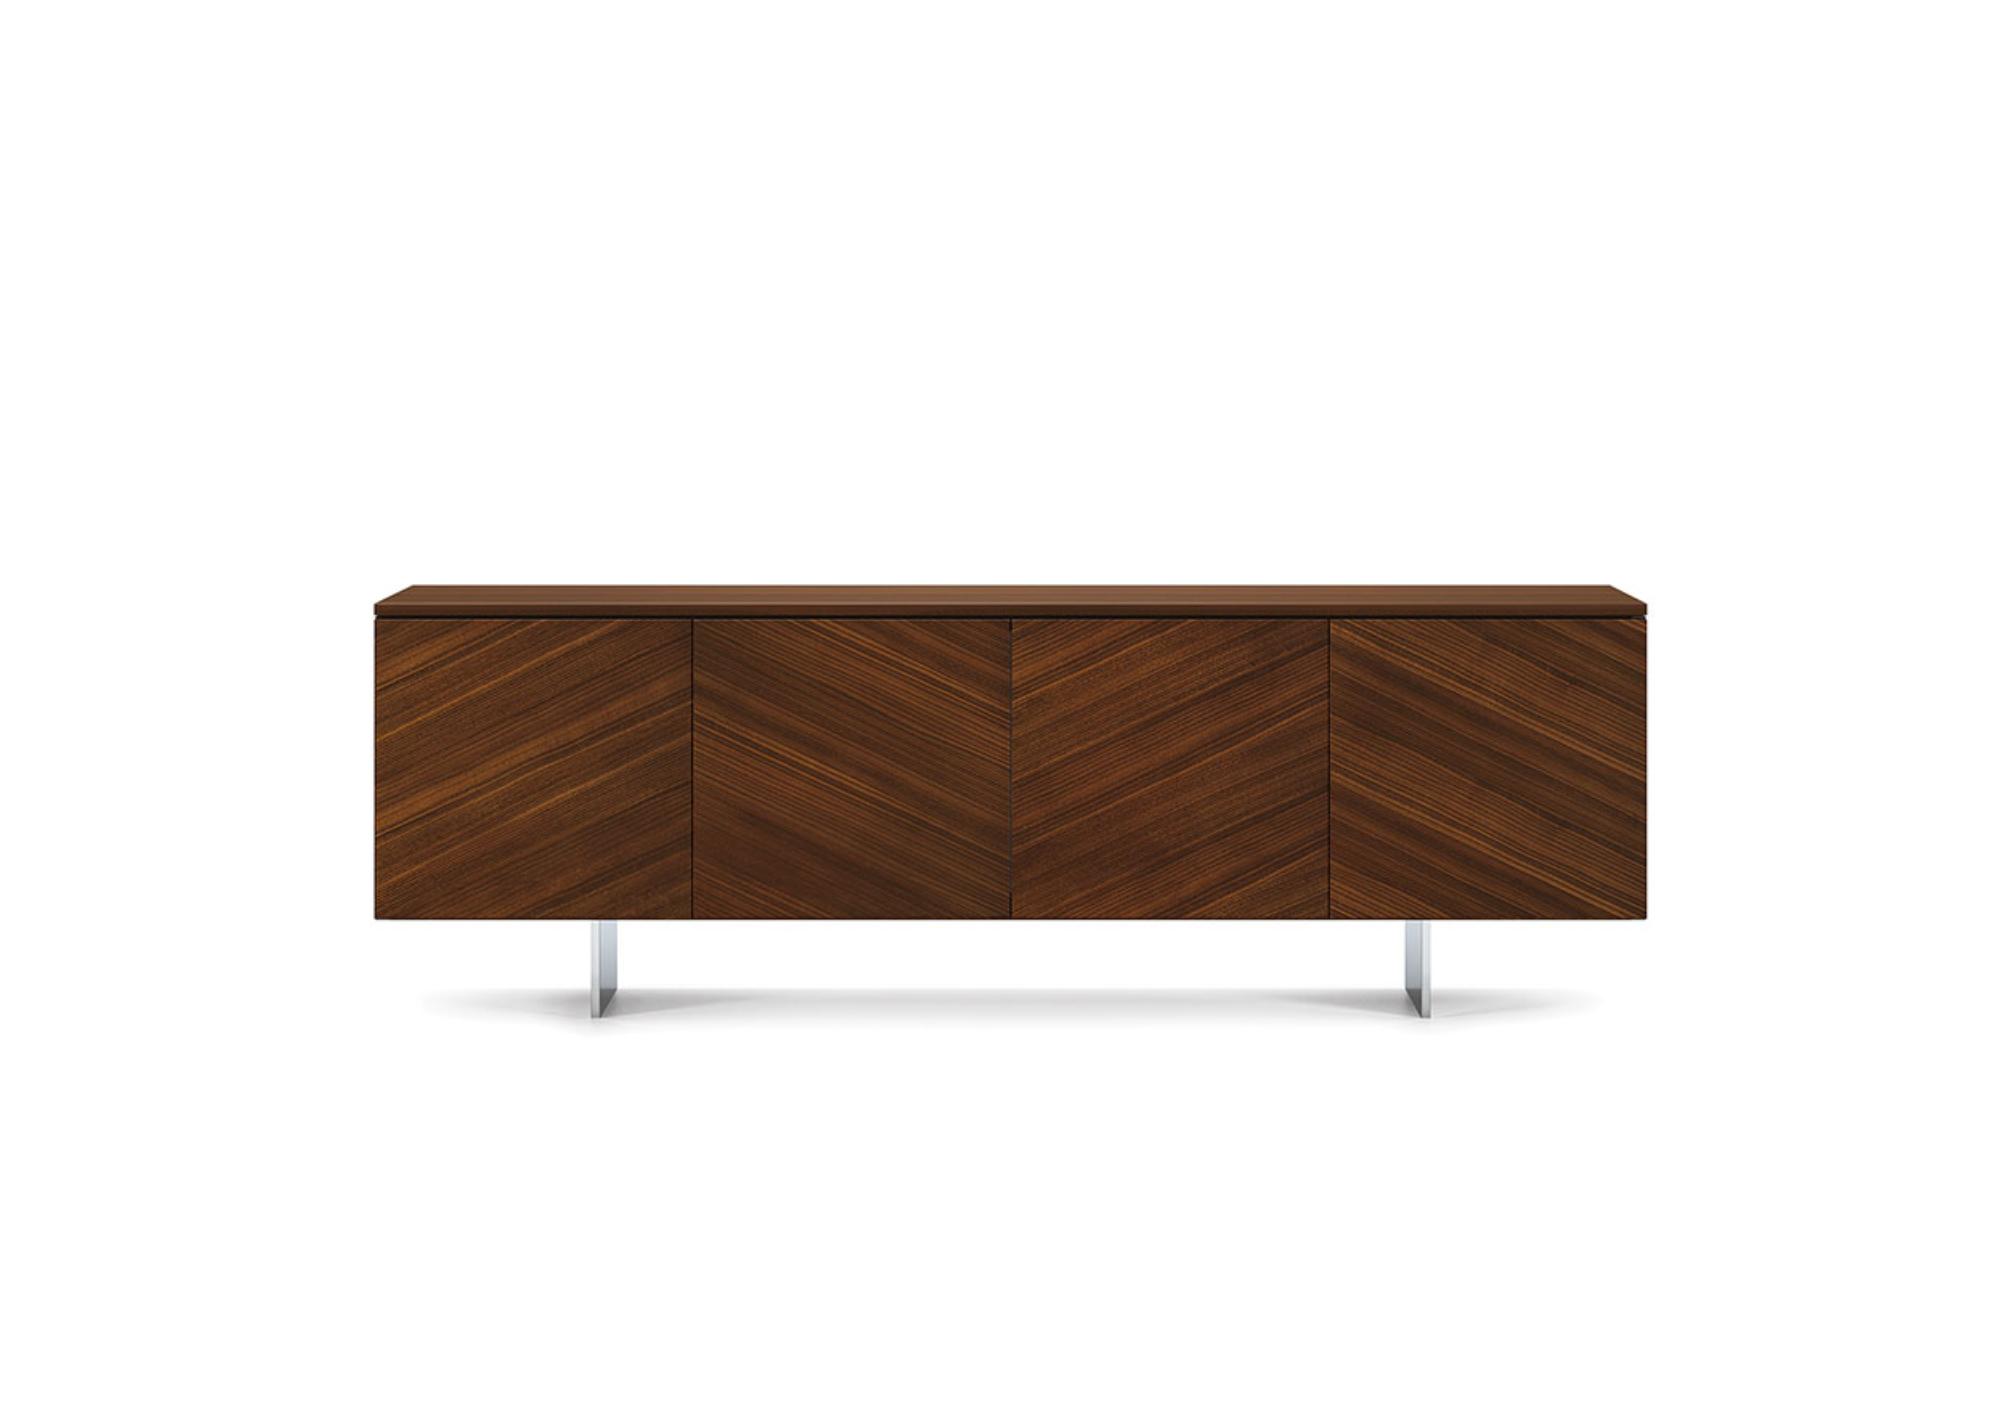 New-Modern-Wood-Credenza